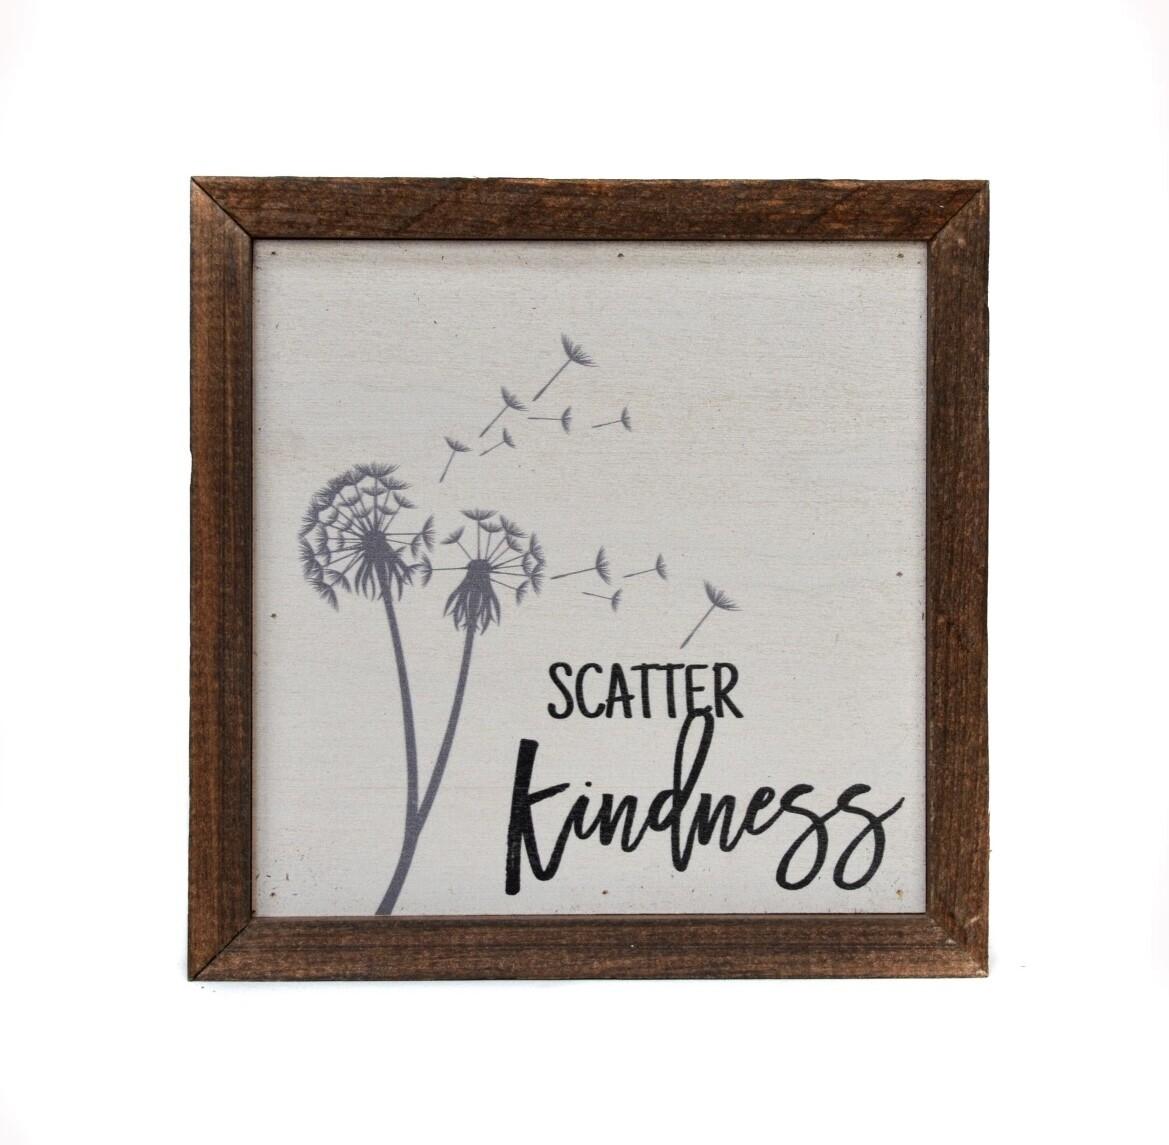 6x6 Scatter Kindness